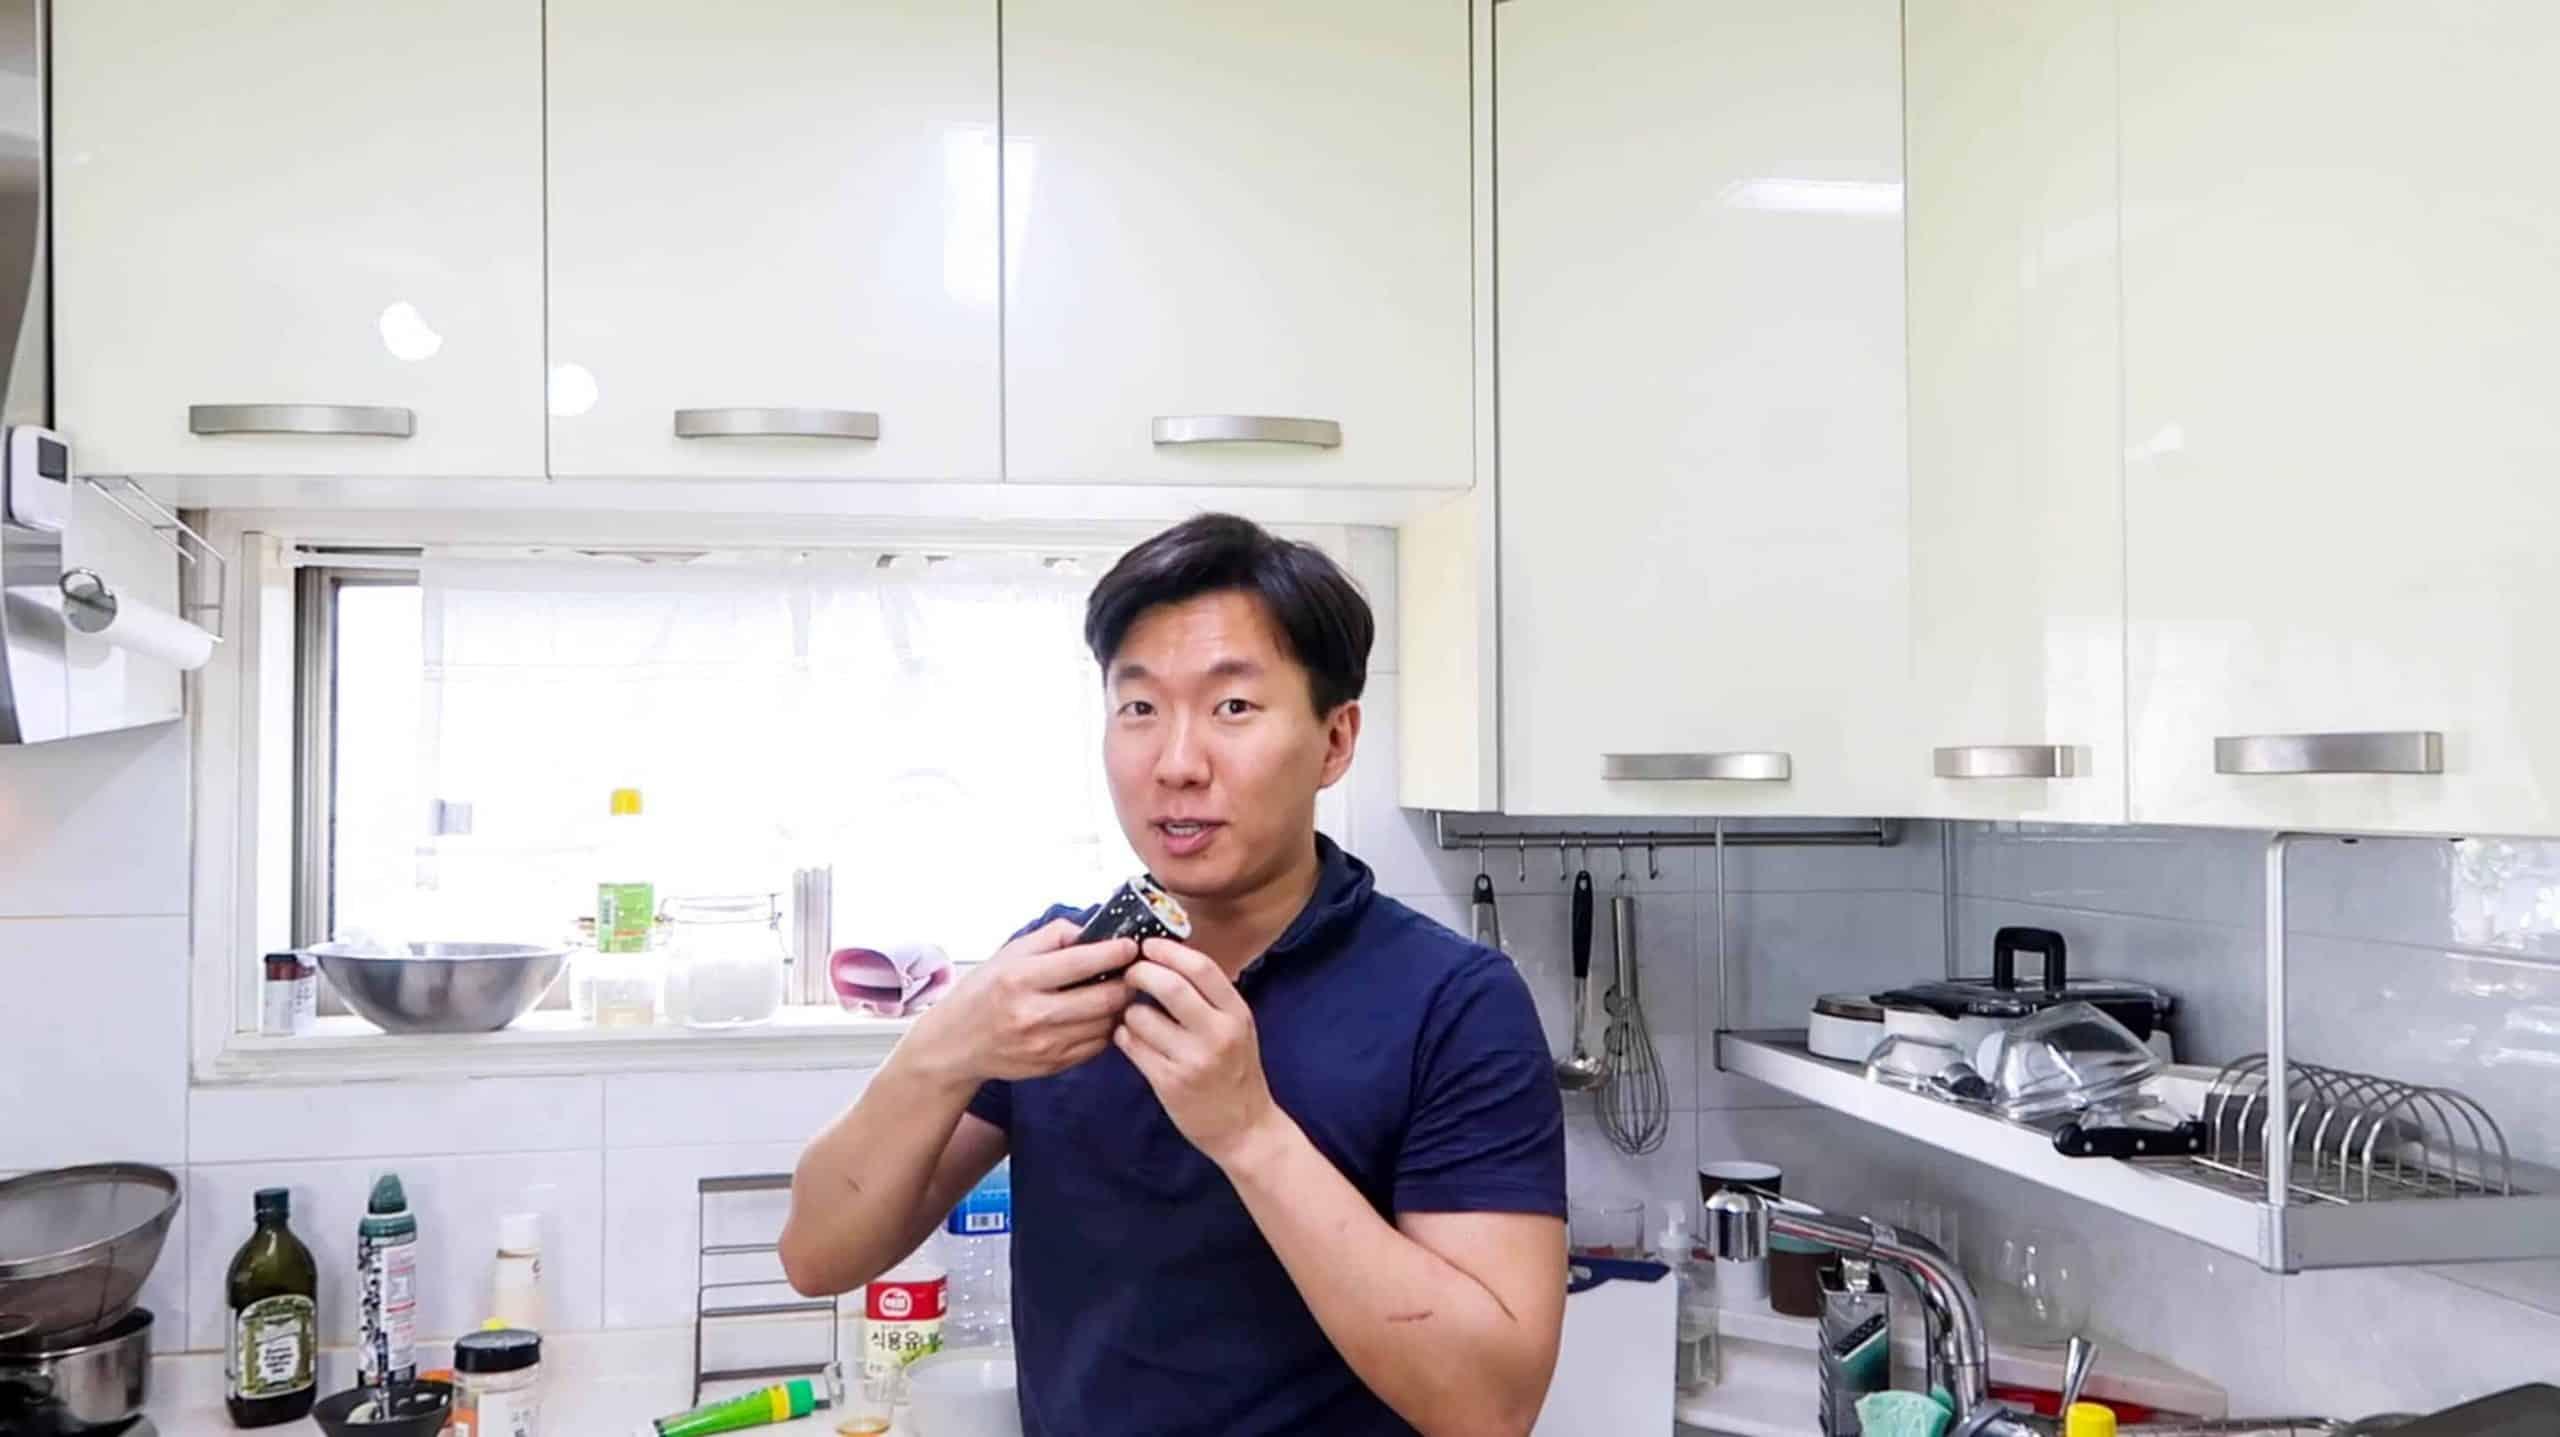 Shrimp Kimbap - Instructions